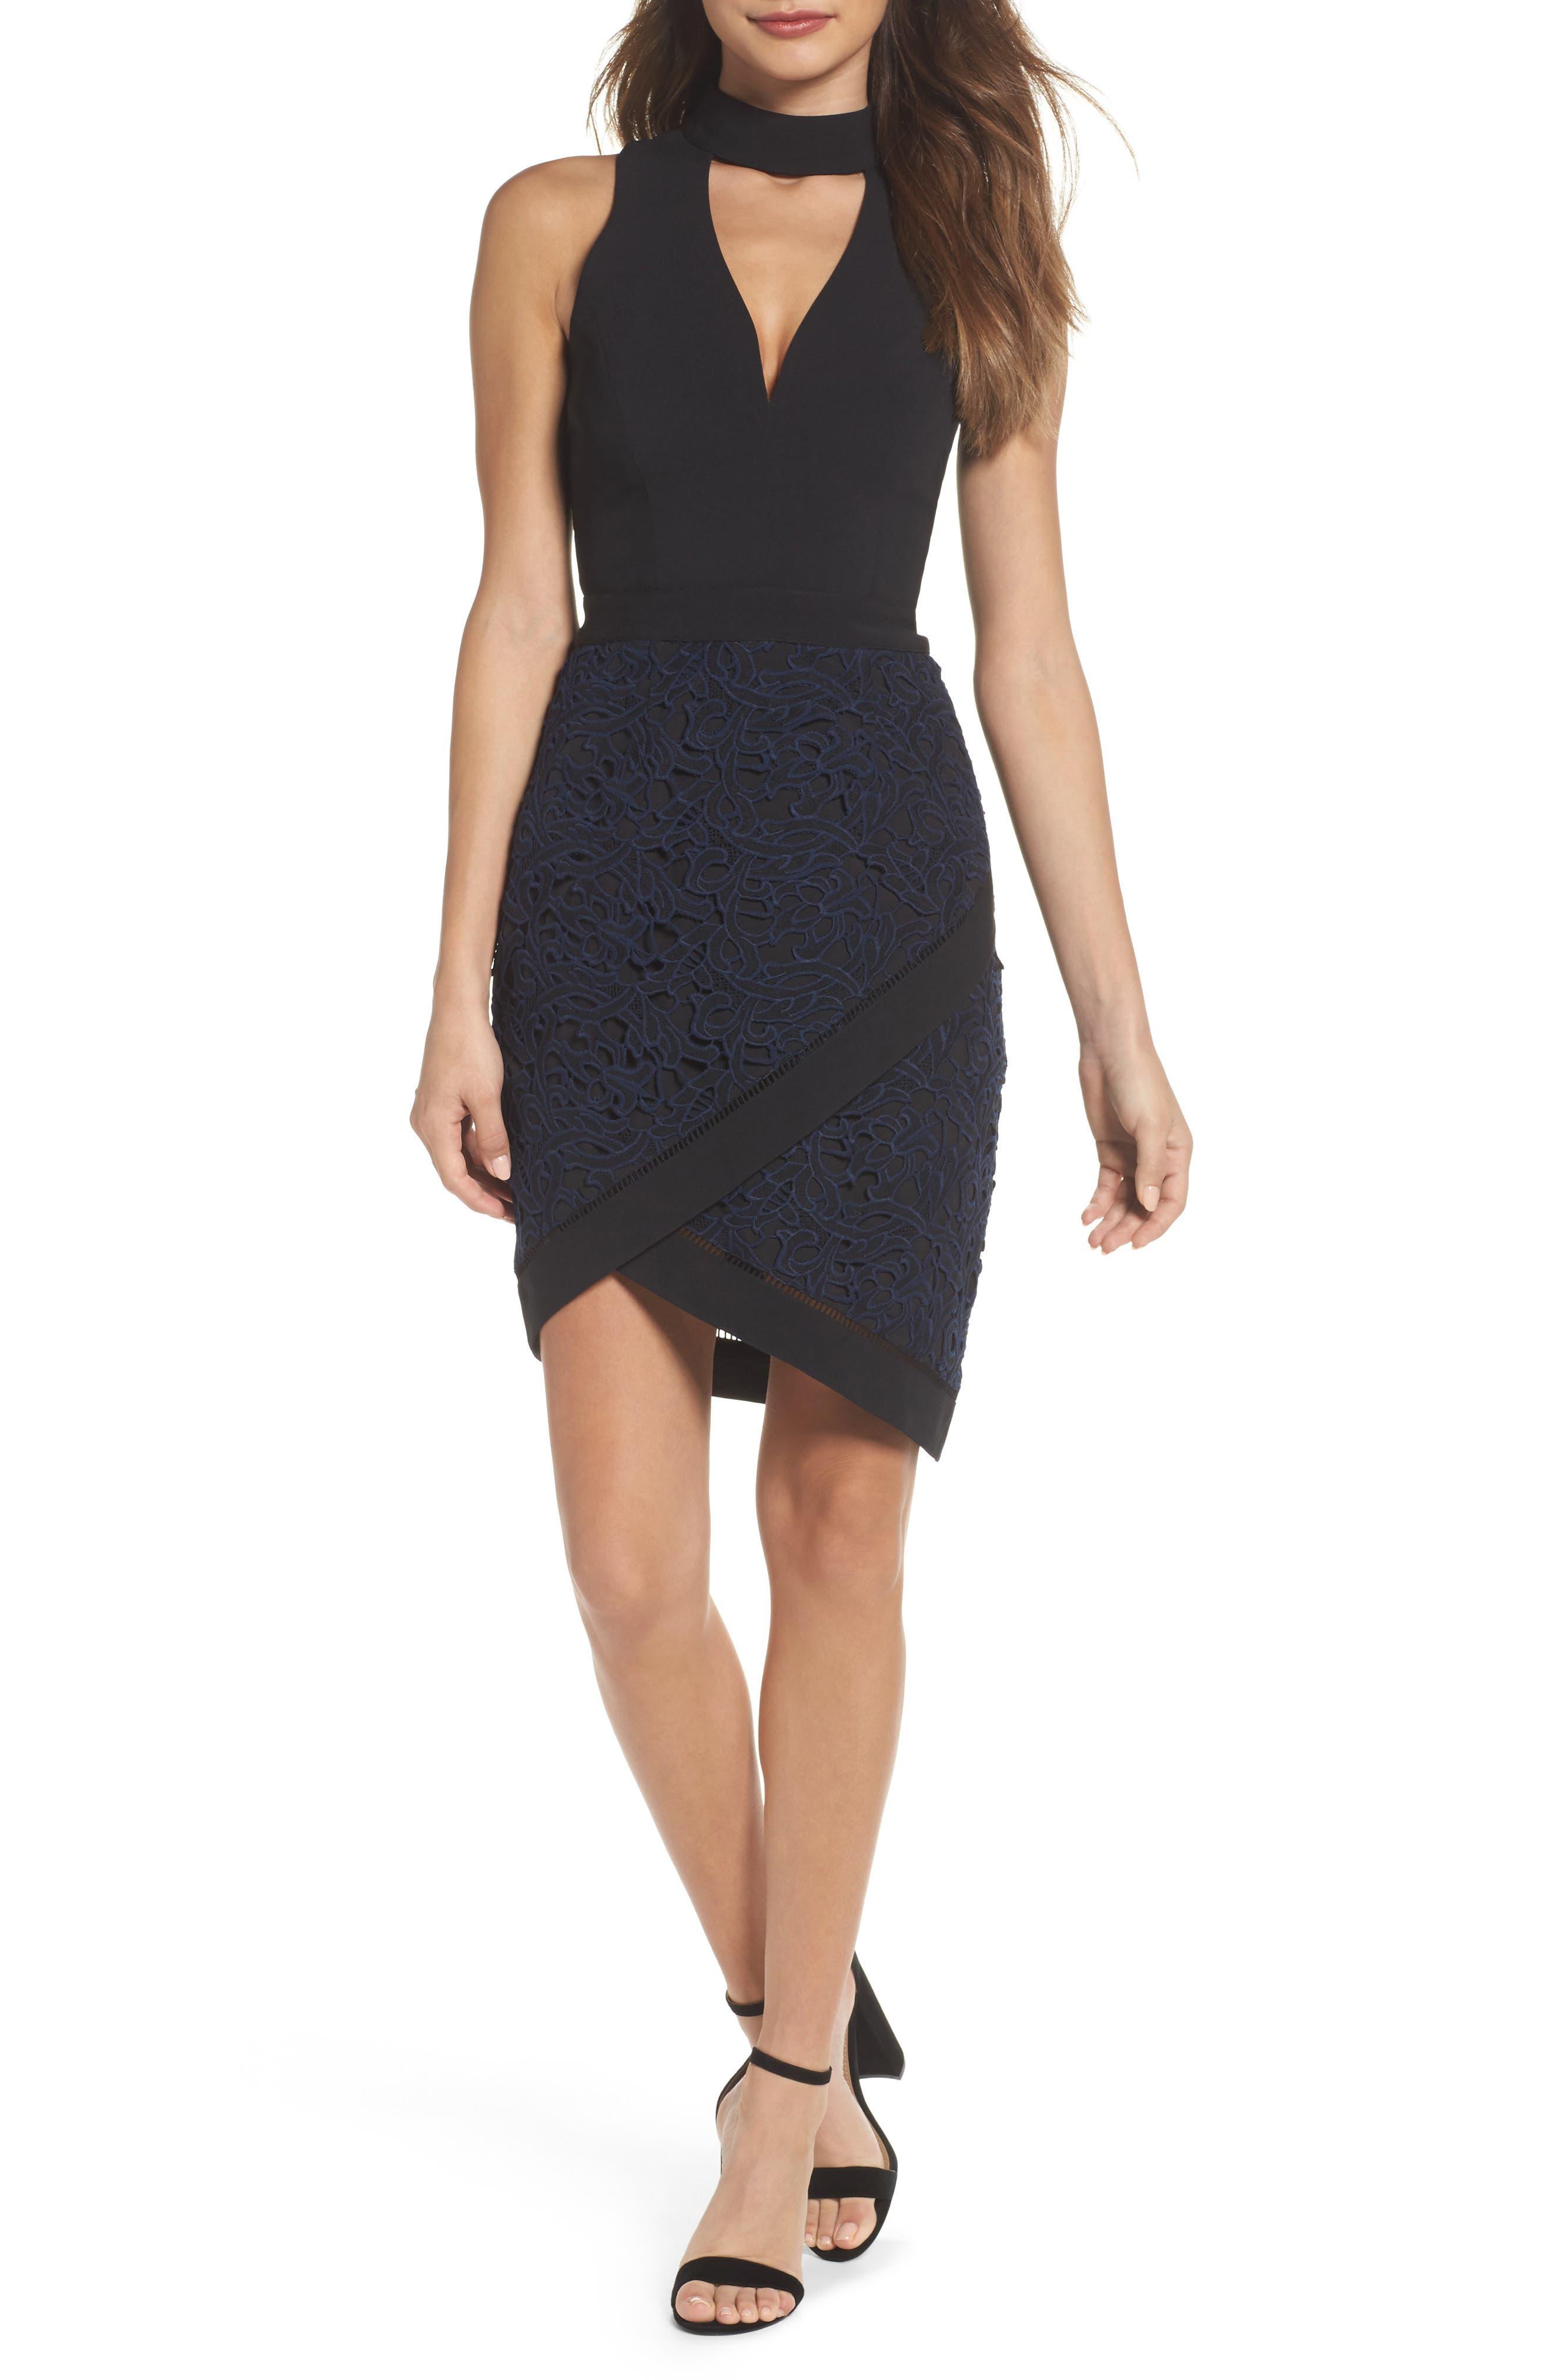 Choker Sheath Dress,                         Main,                         color, Black/ Navy